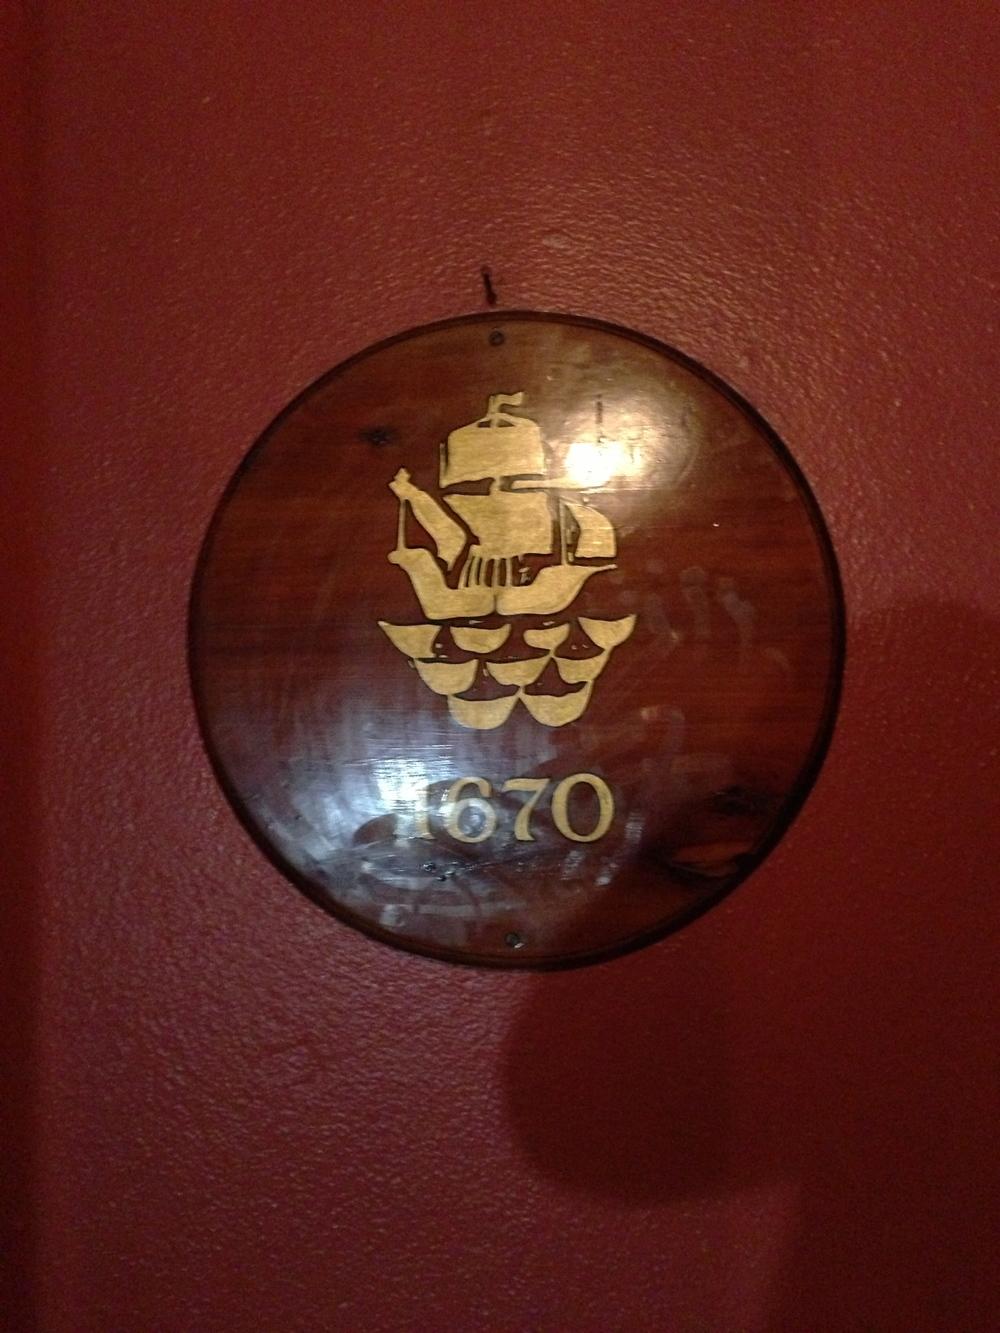 Bermuda Restaurant Founded 1670 - 2013